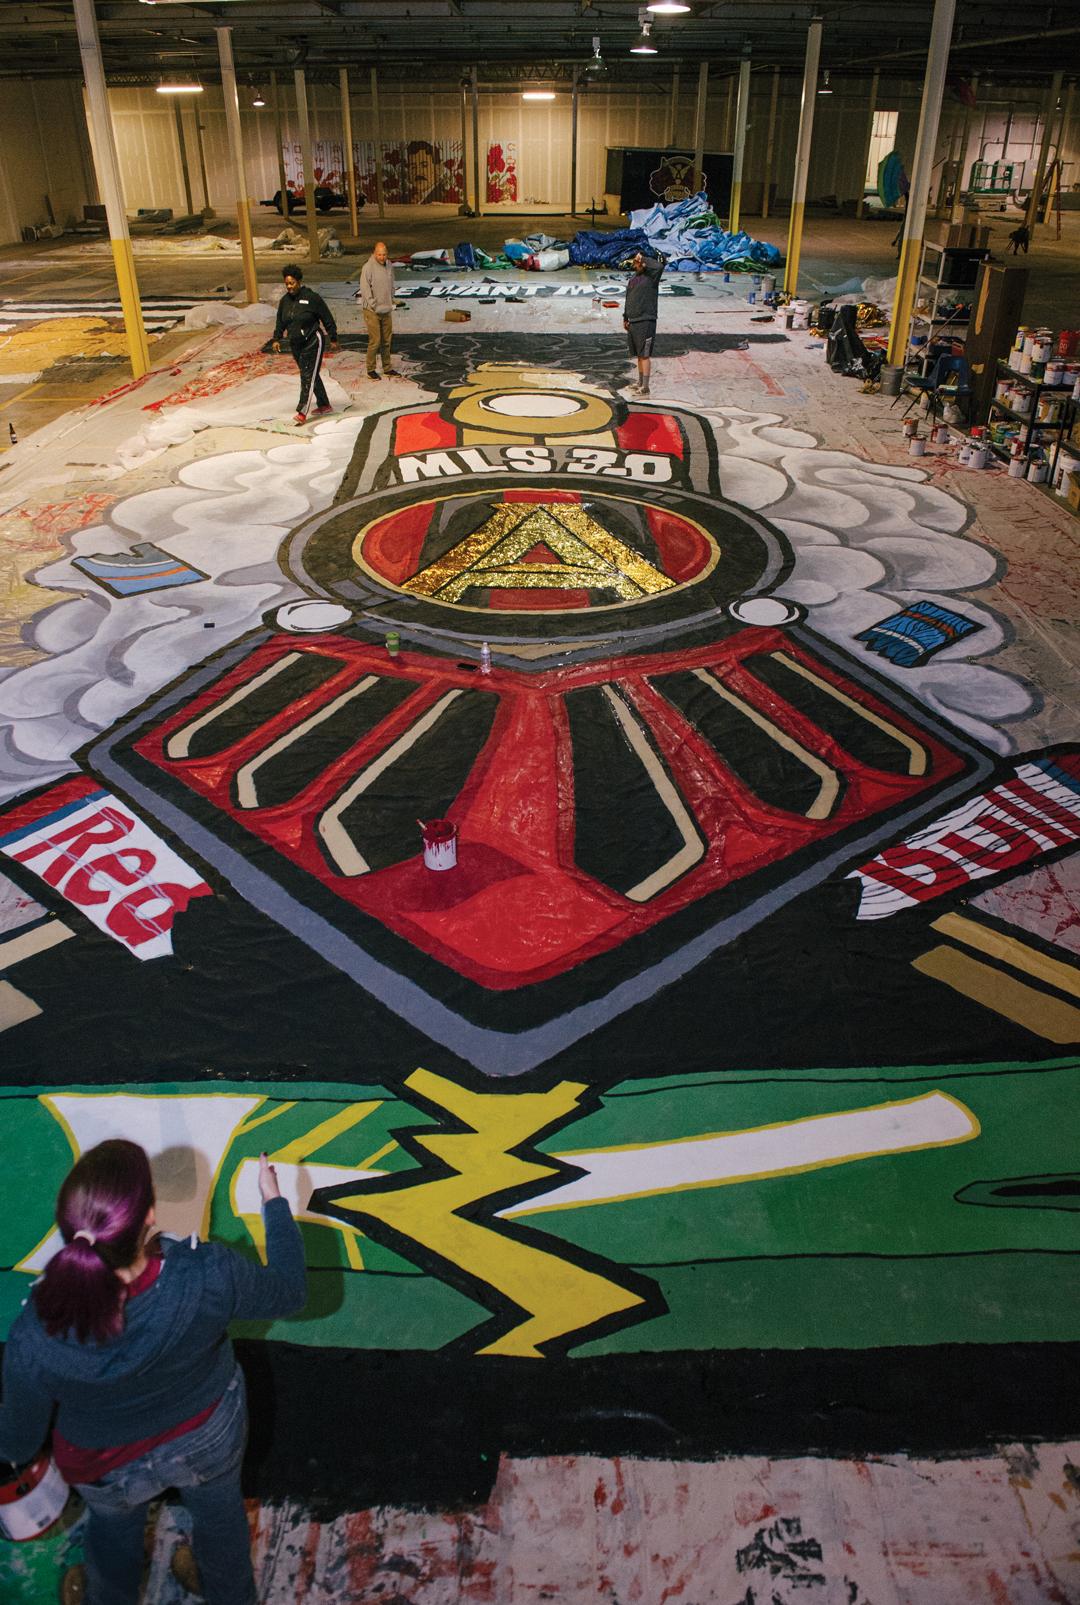 Atlanta United tifos